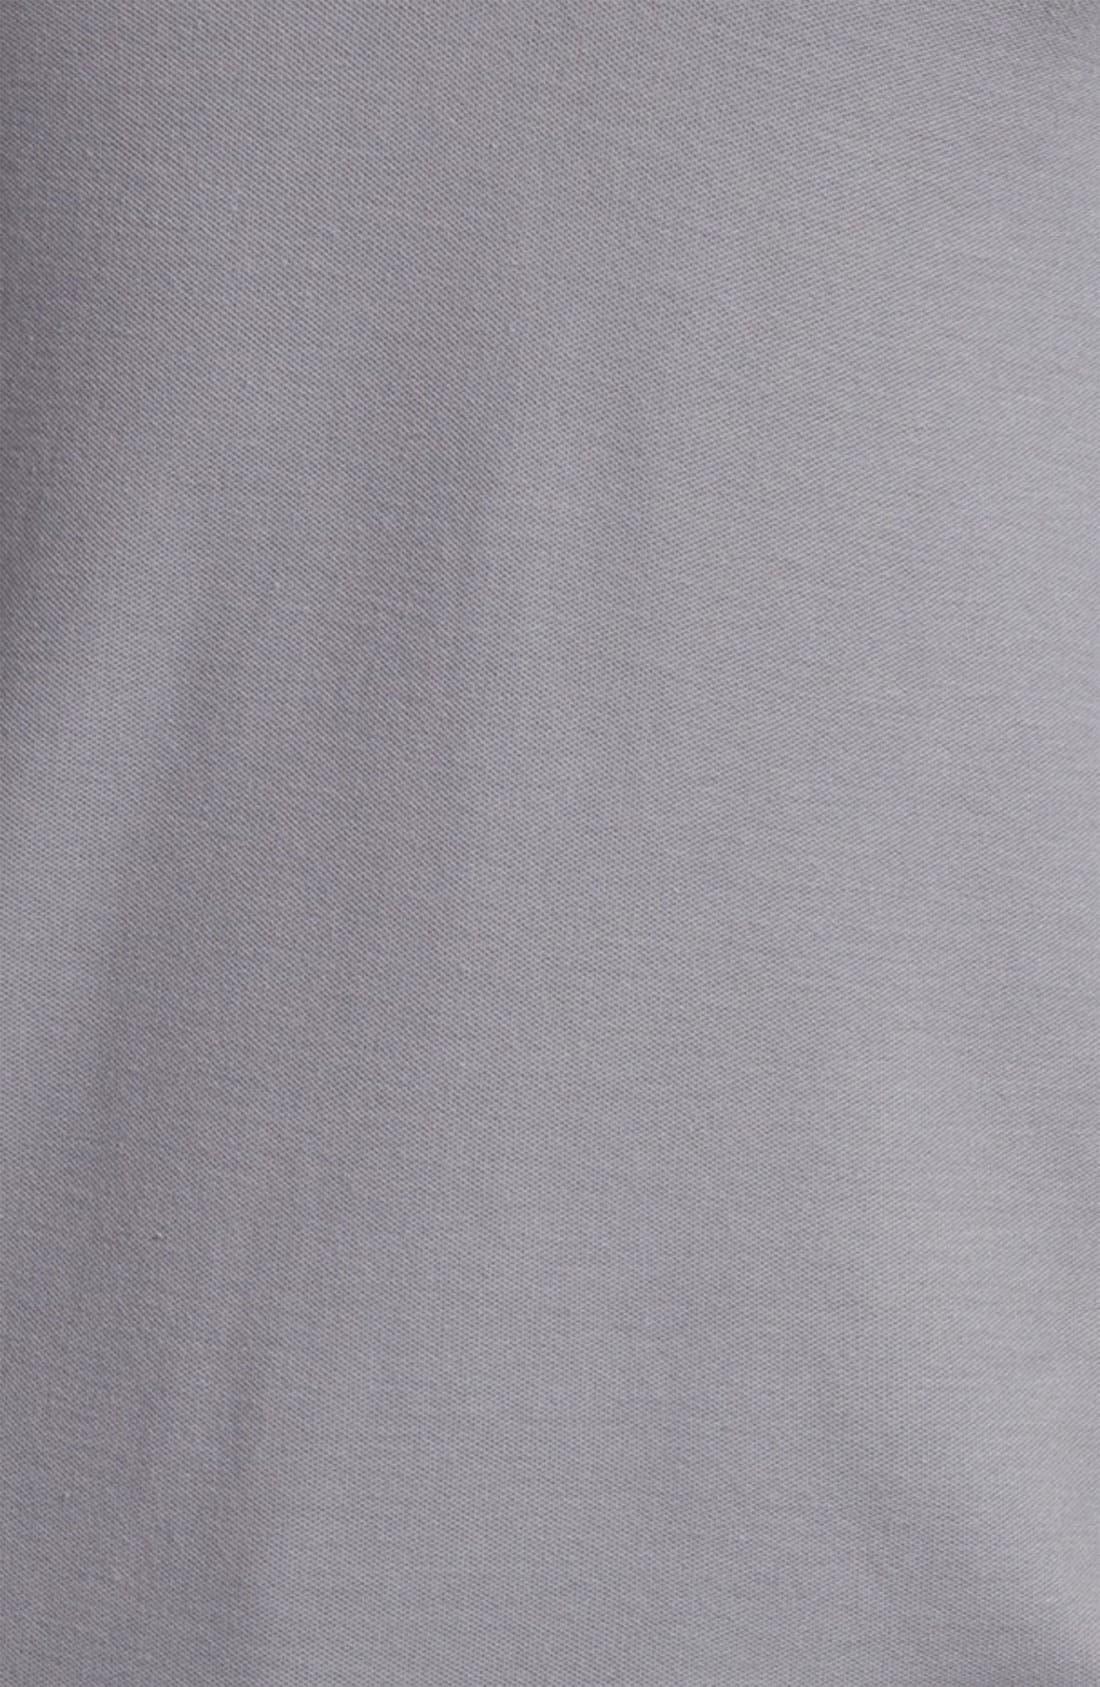 Alternate Image 3  - NSF Clothing 'Carl' Polo